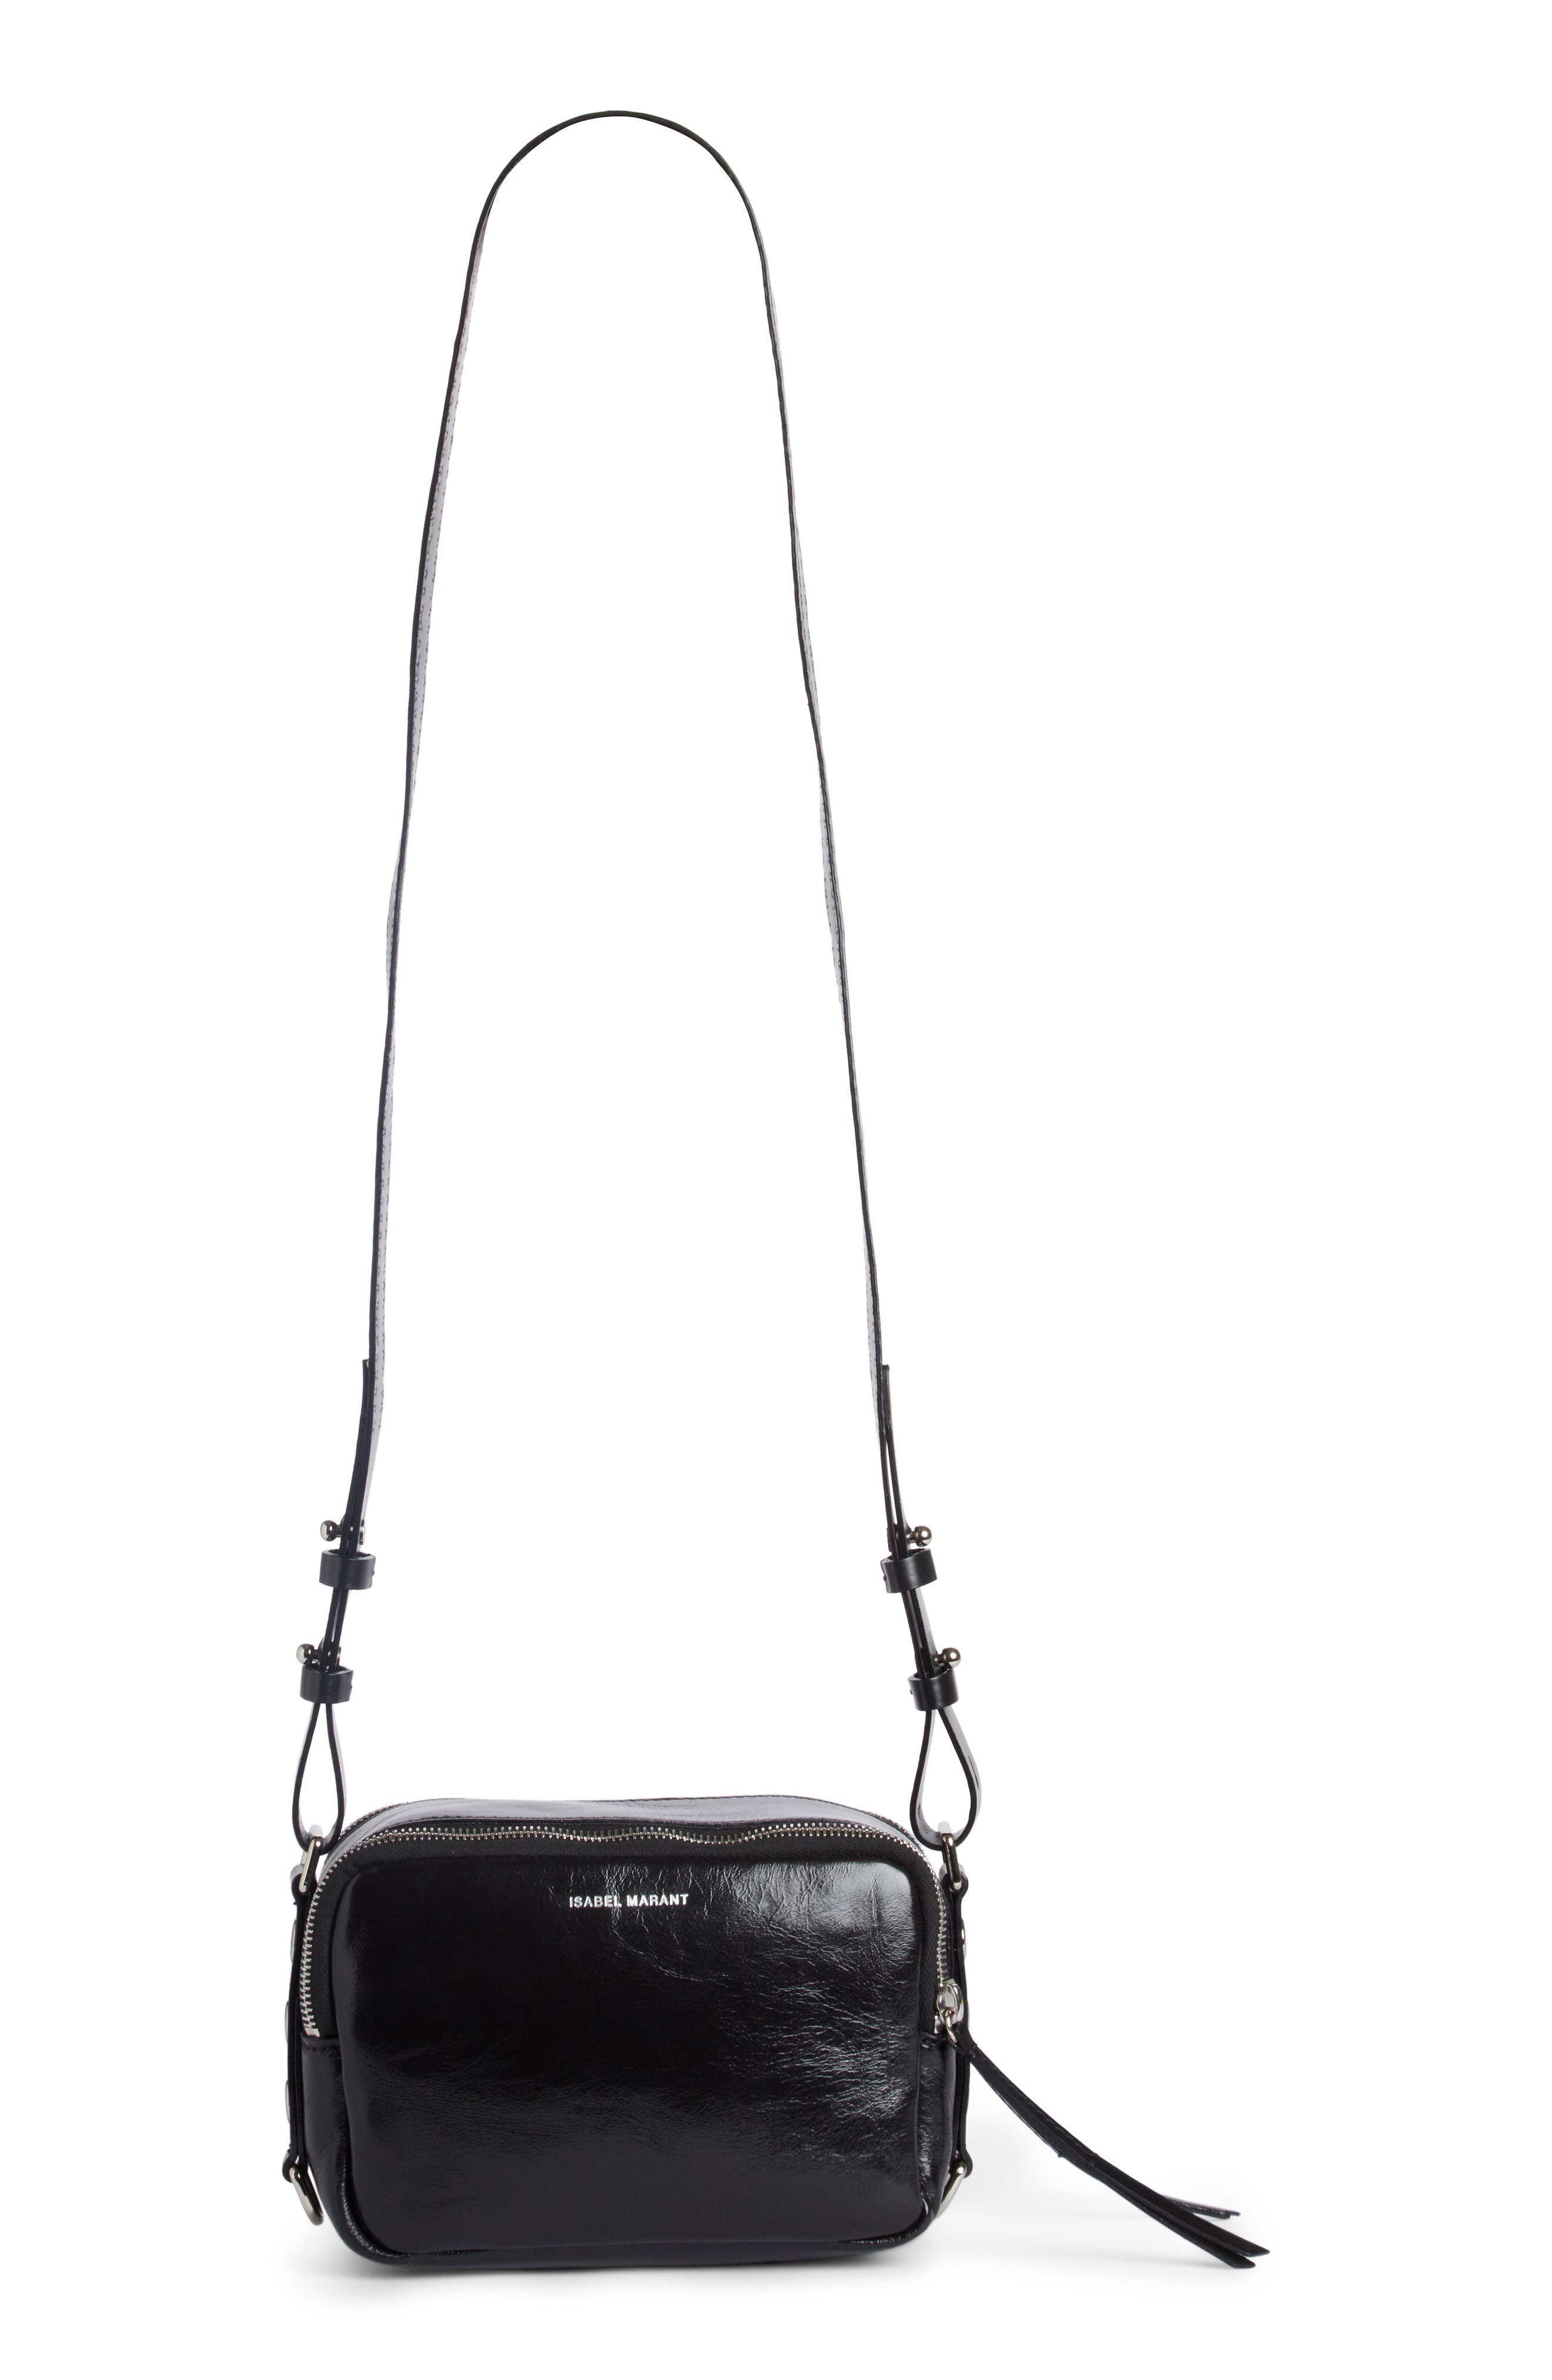 Isabel Marant Tinley Studded Leather Crossbody Bag